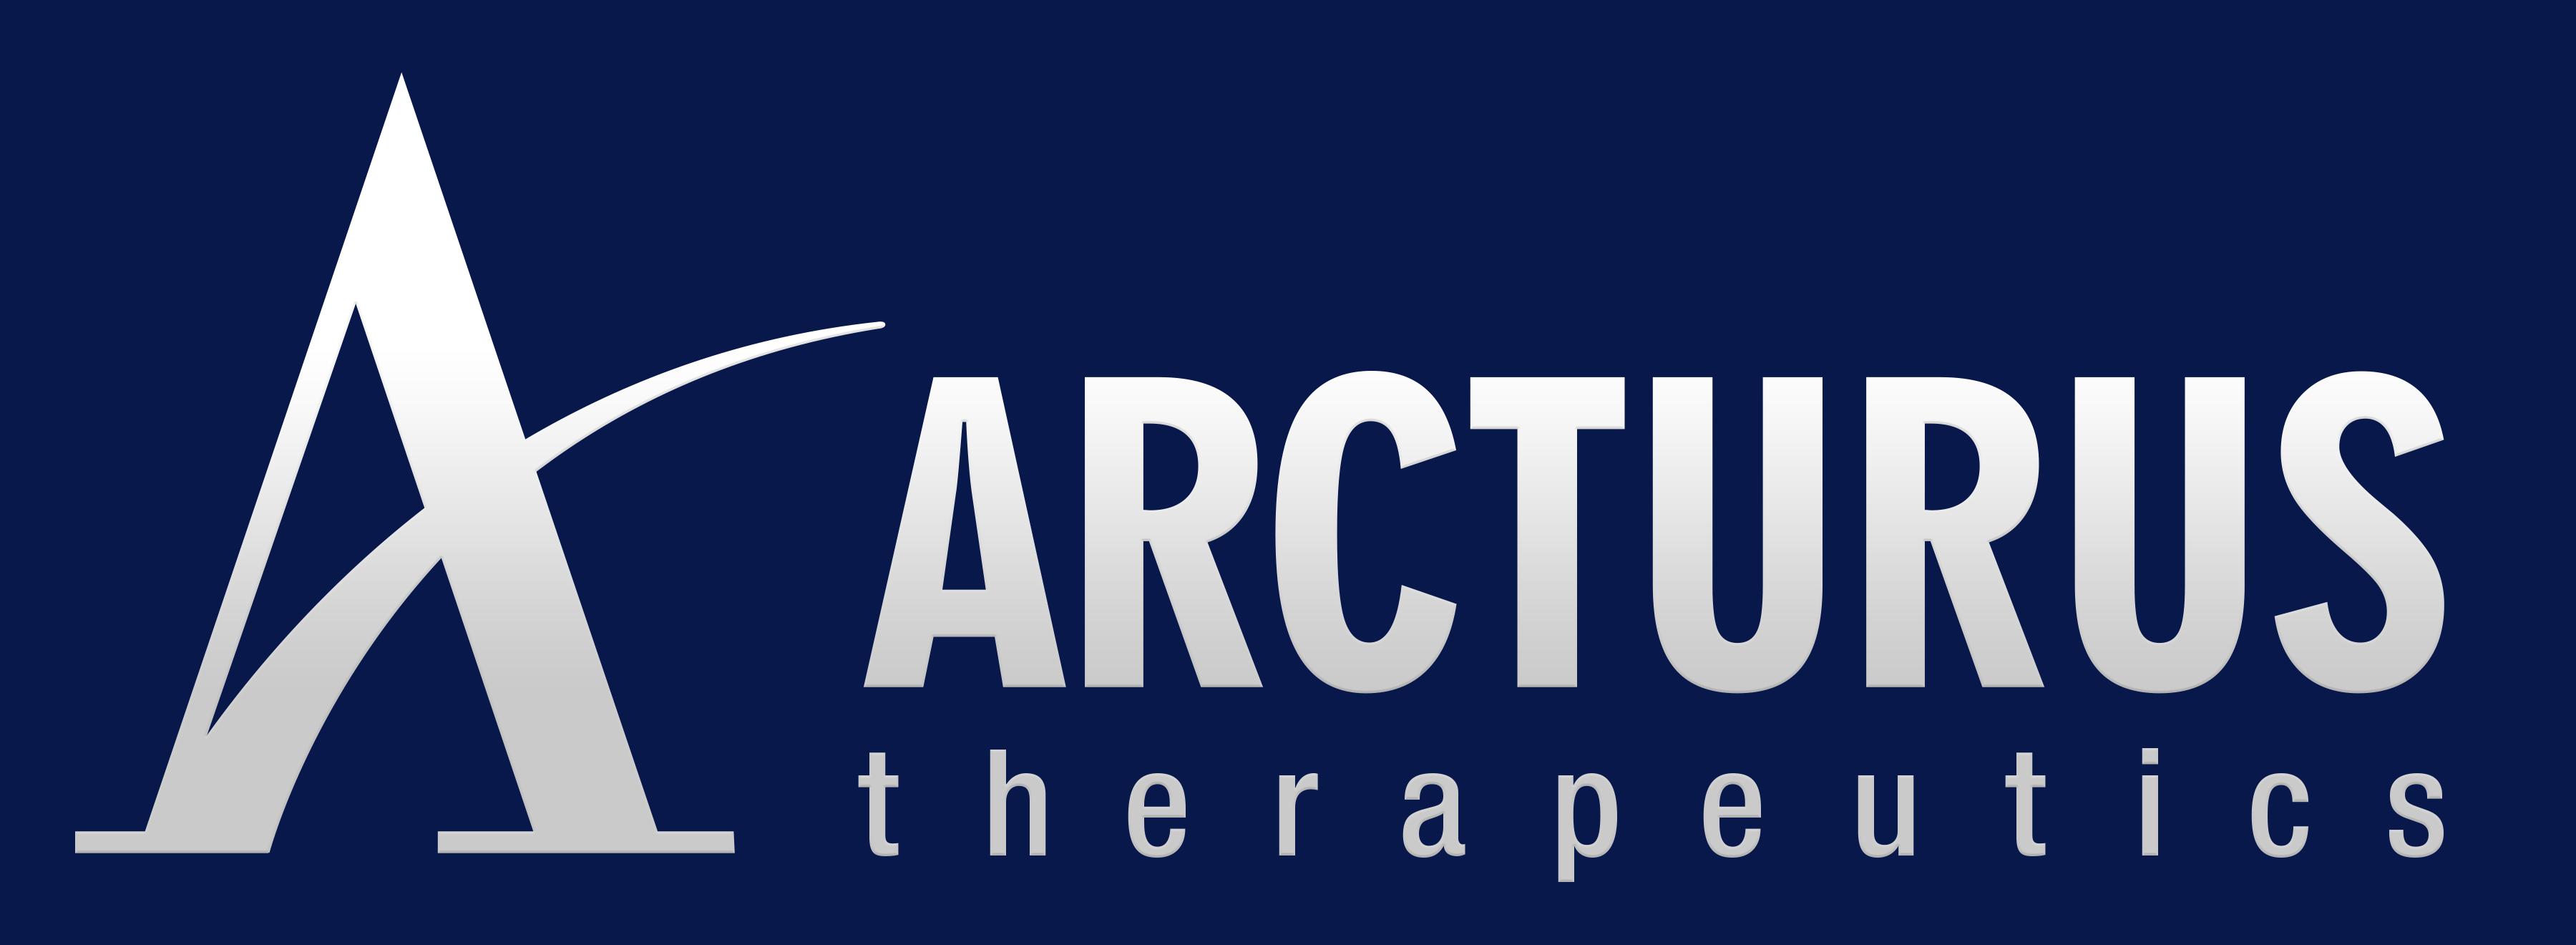 arcturus-logo-blueback